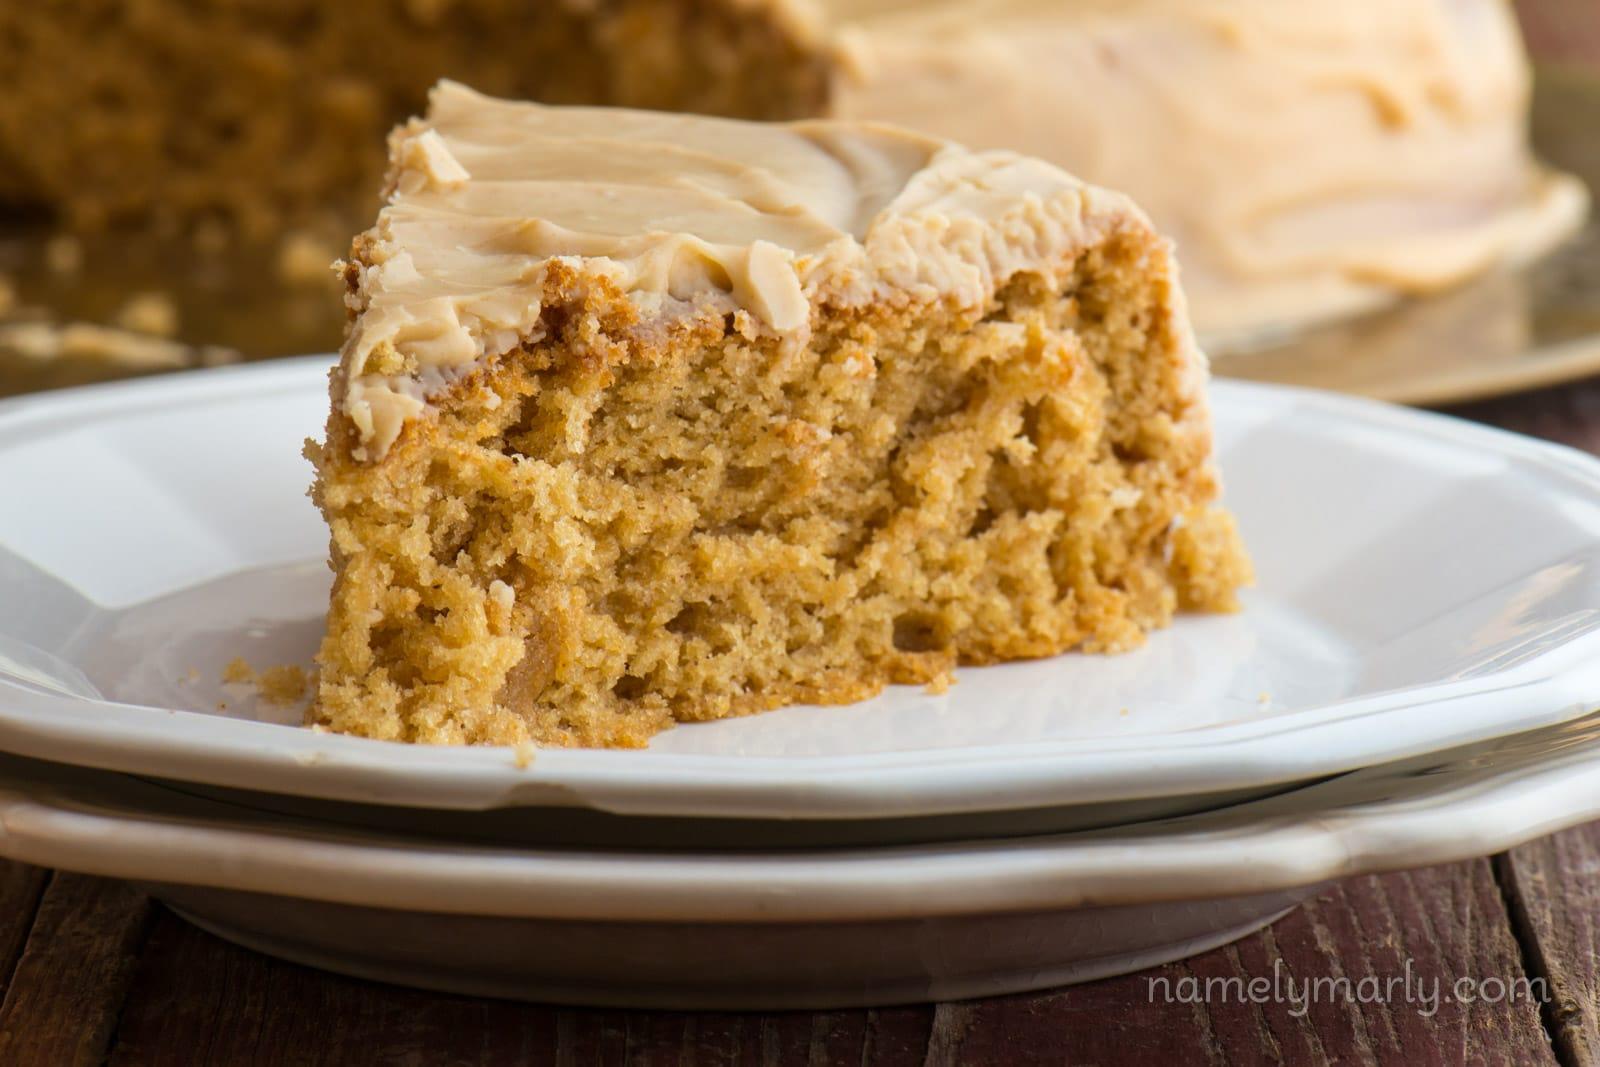 Vegan Peanut Butter Wacky Cake